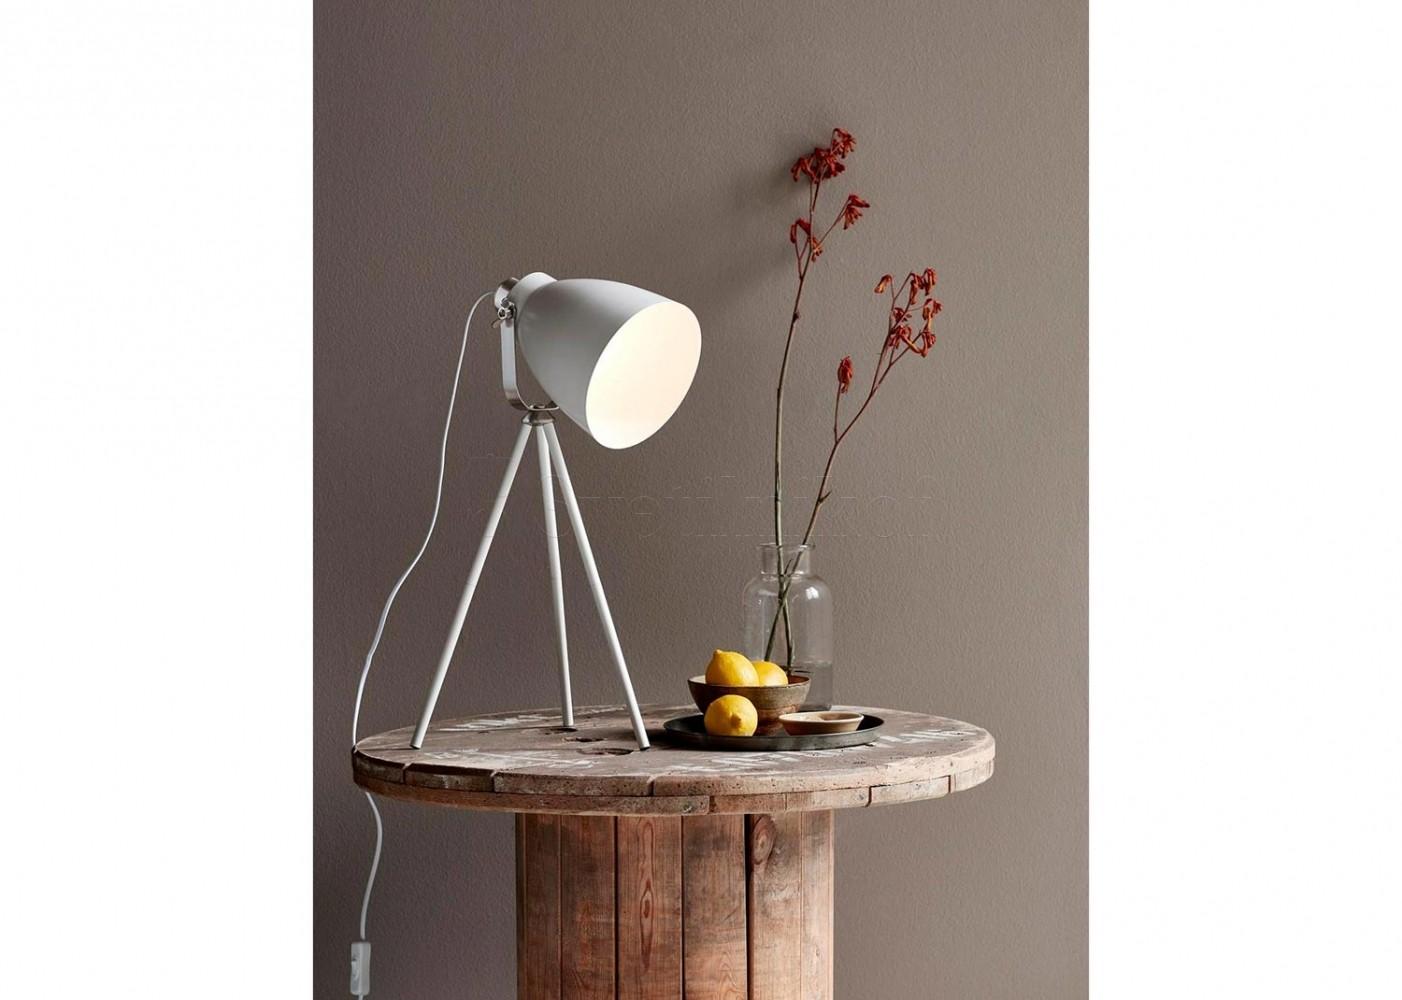 Настольная лампа Nordlux Largo 46655001 - 1